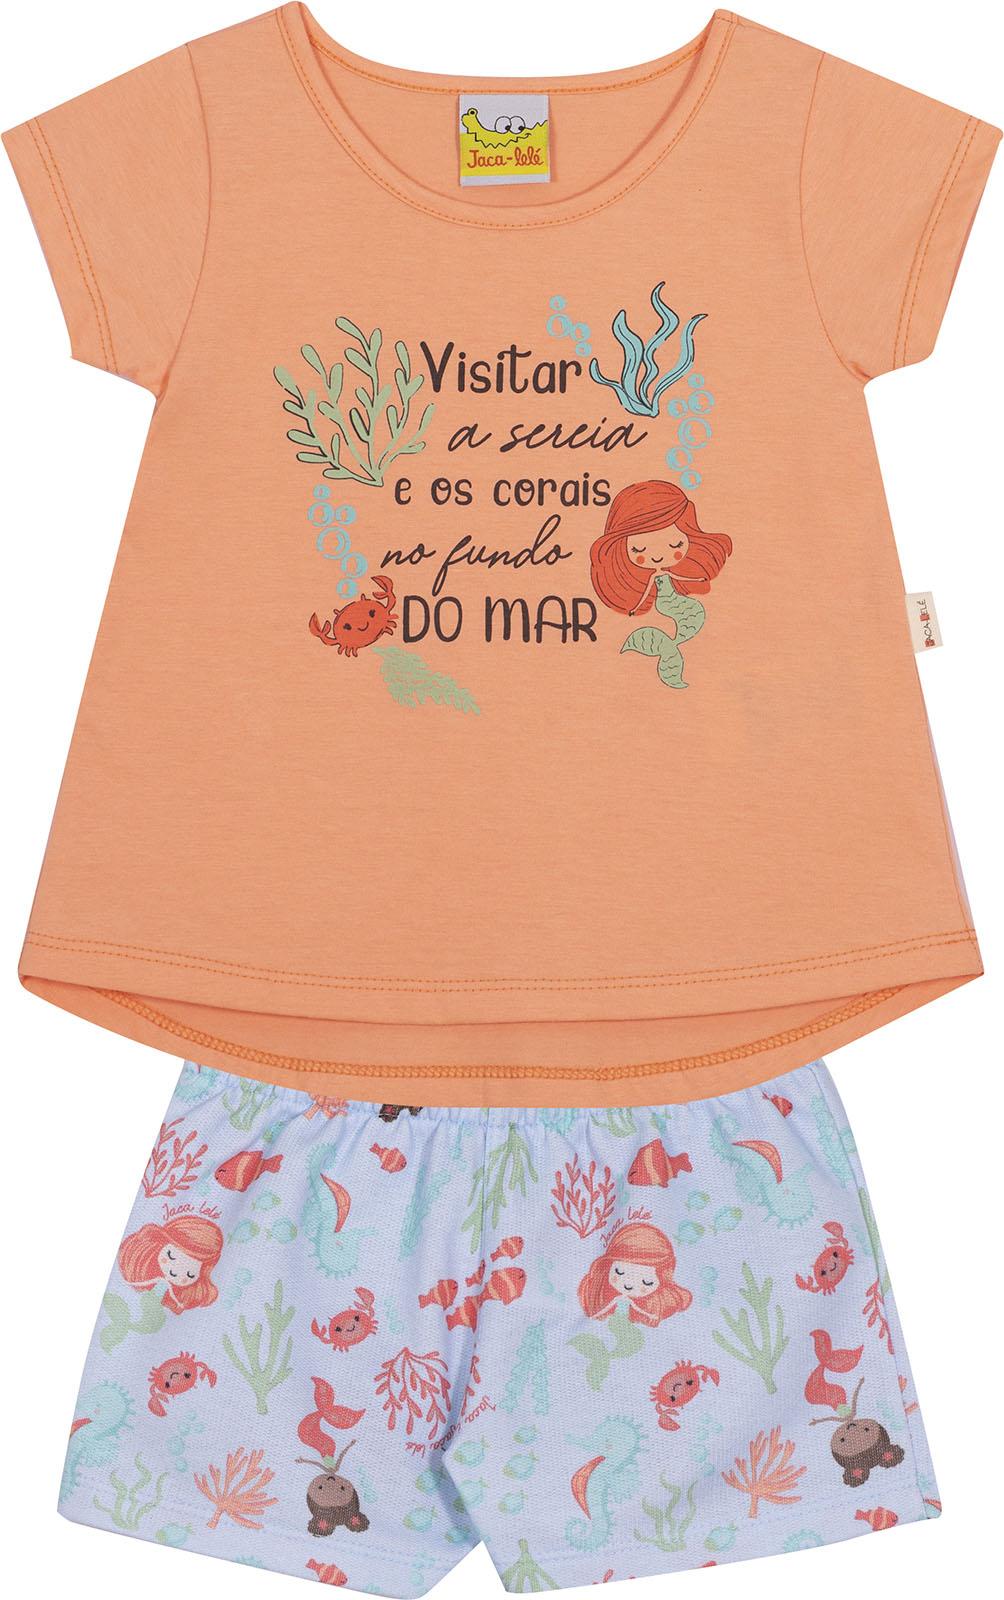 Conjunto Infantil Blusa e Shorts JACA-LELÉ Sereia Laranja e Azul